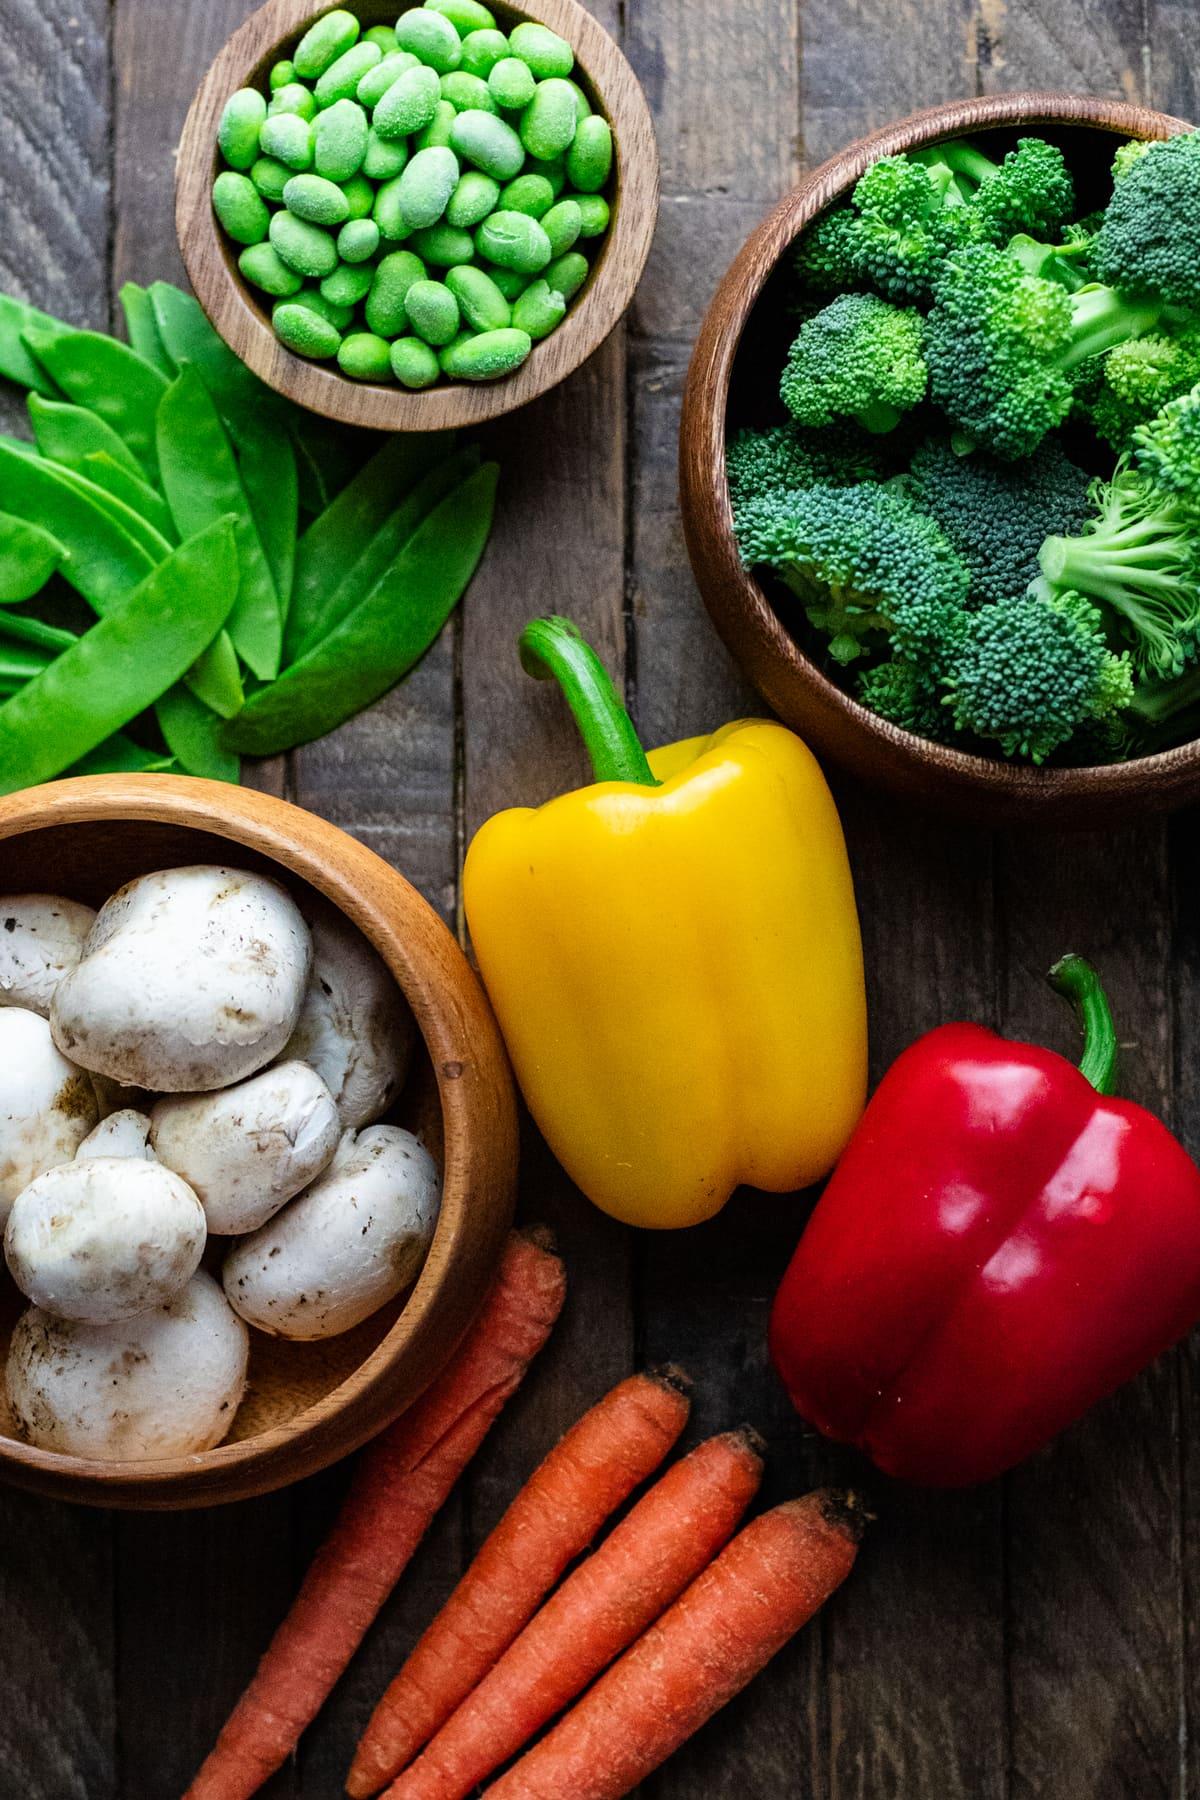 vegetables arranged on brown wooden board.